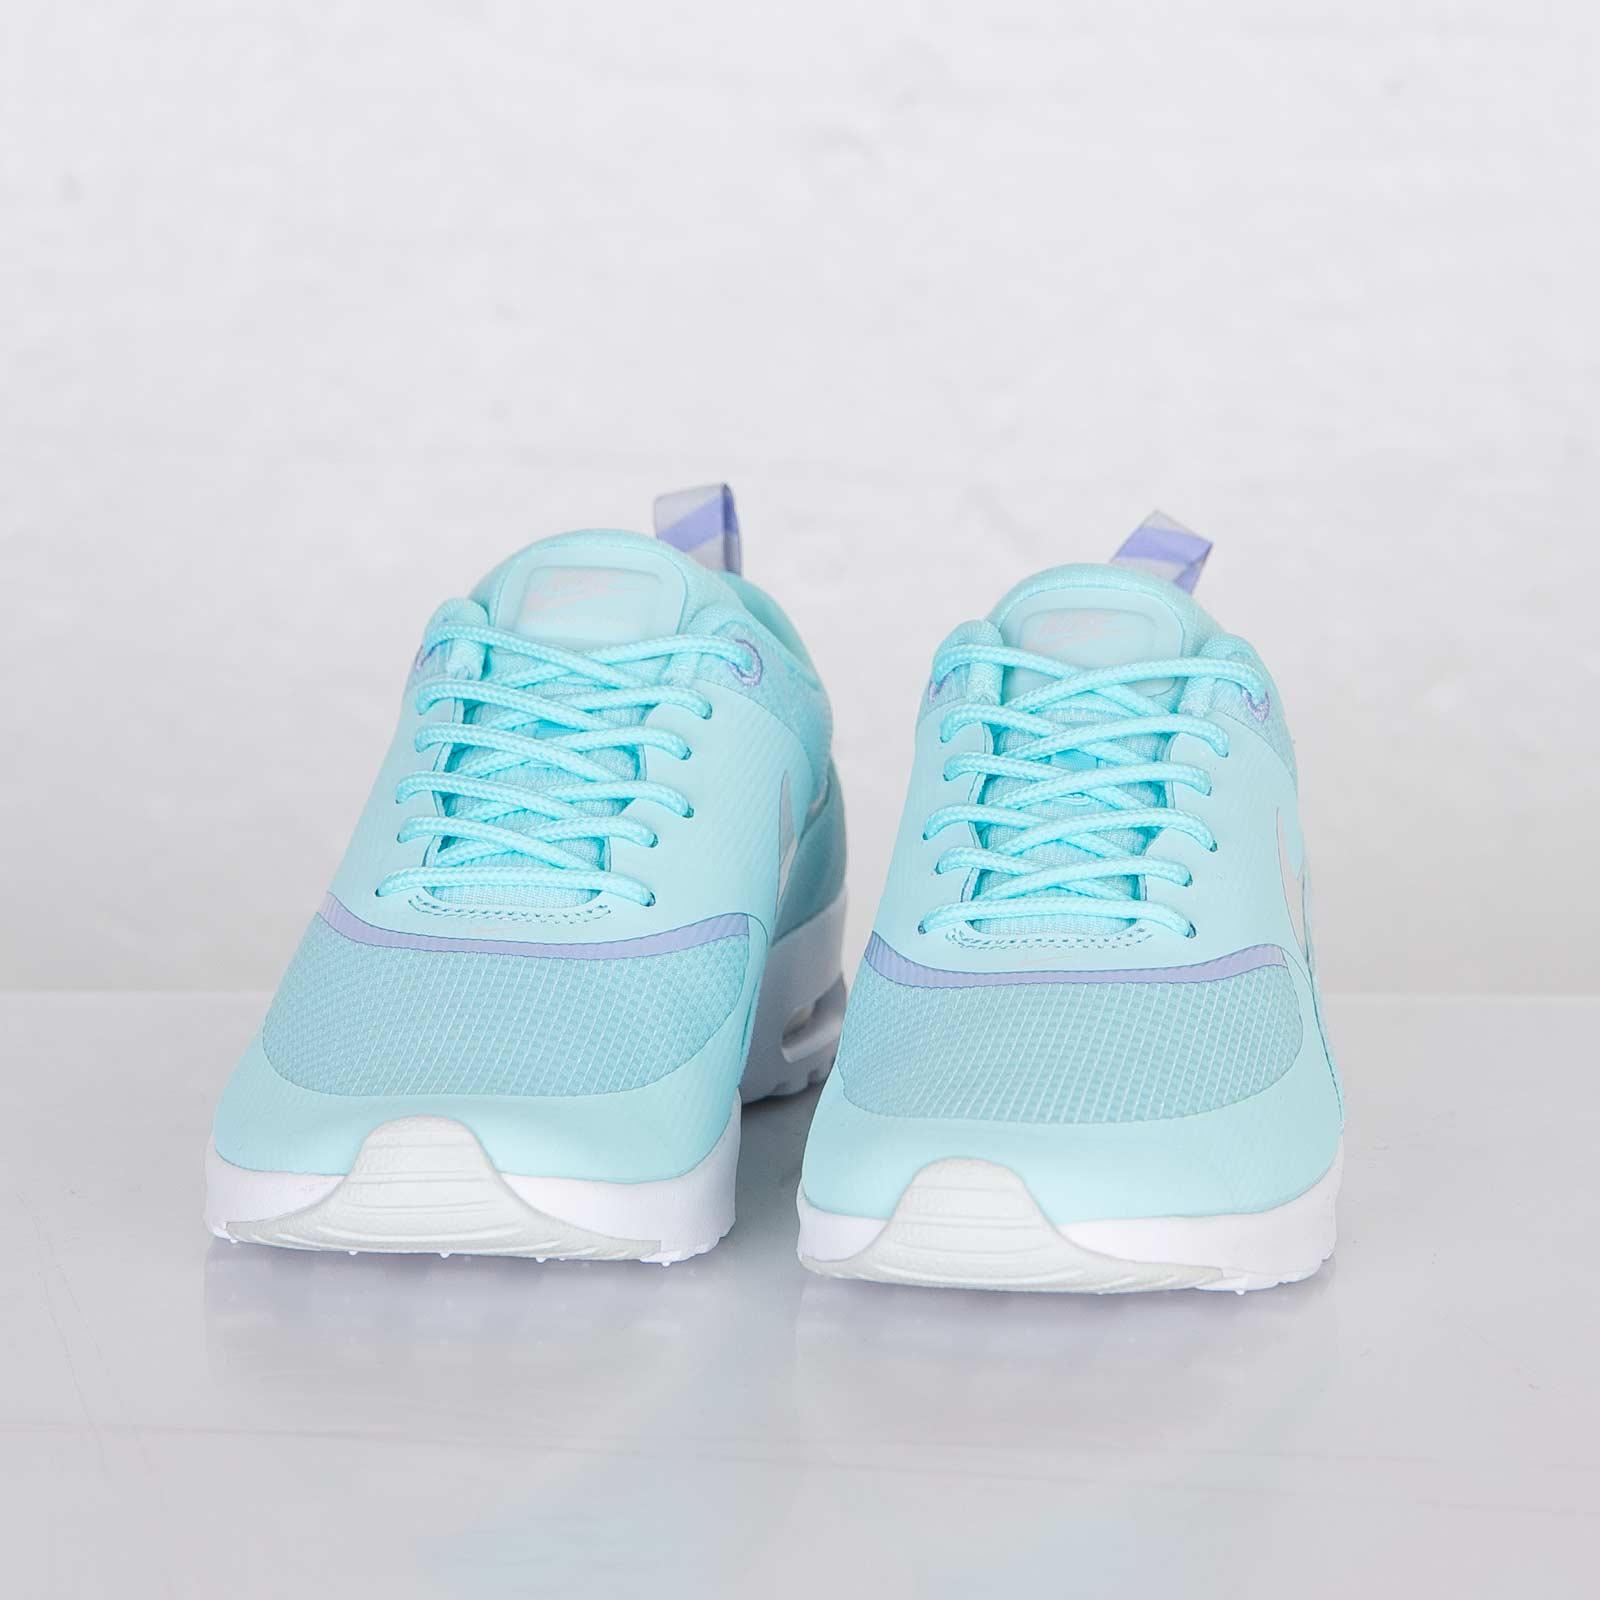 28851c1a68 Nike Wmns Nike Air Max Thea - 599409-402 - Sneakersnstuff   sneakers &  streetwear online since 1999